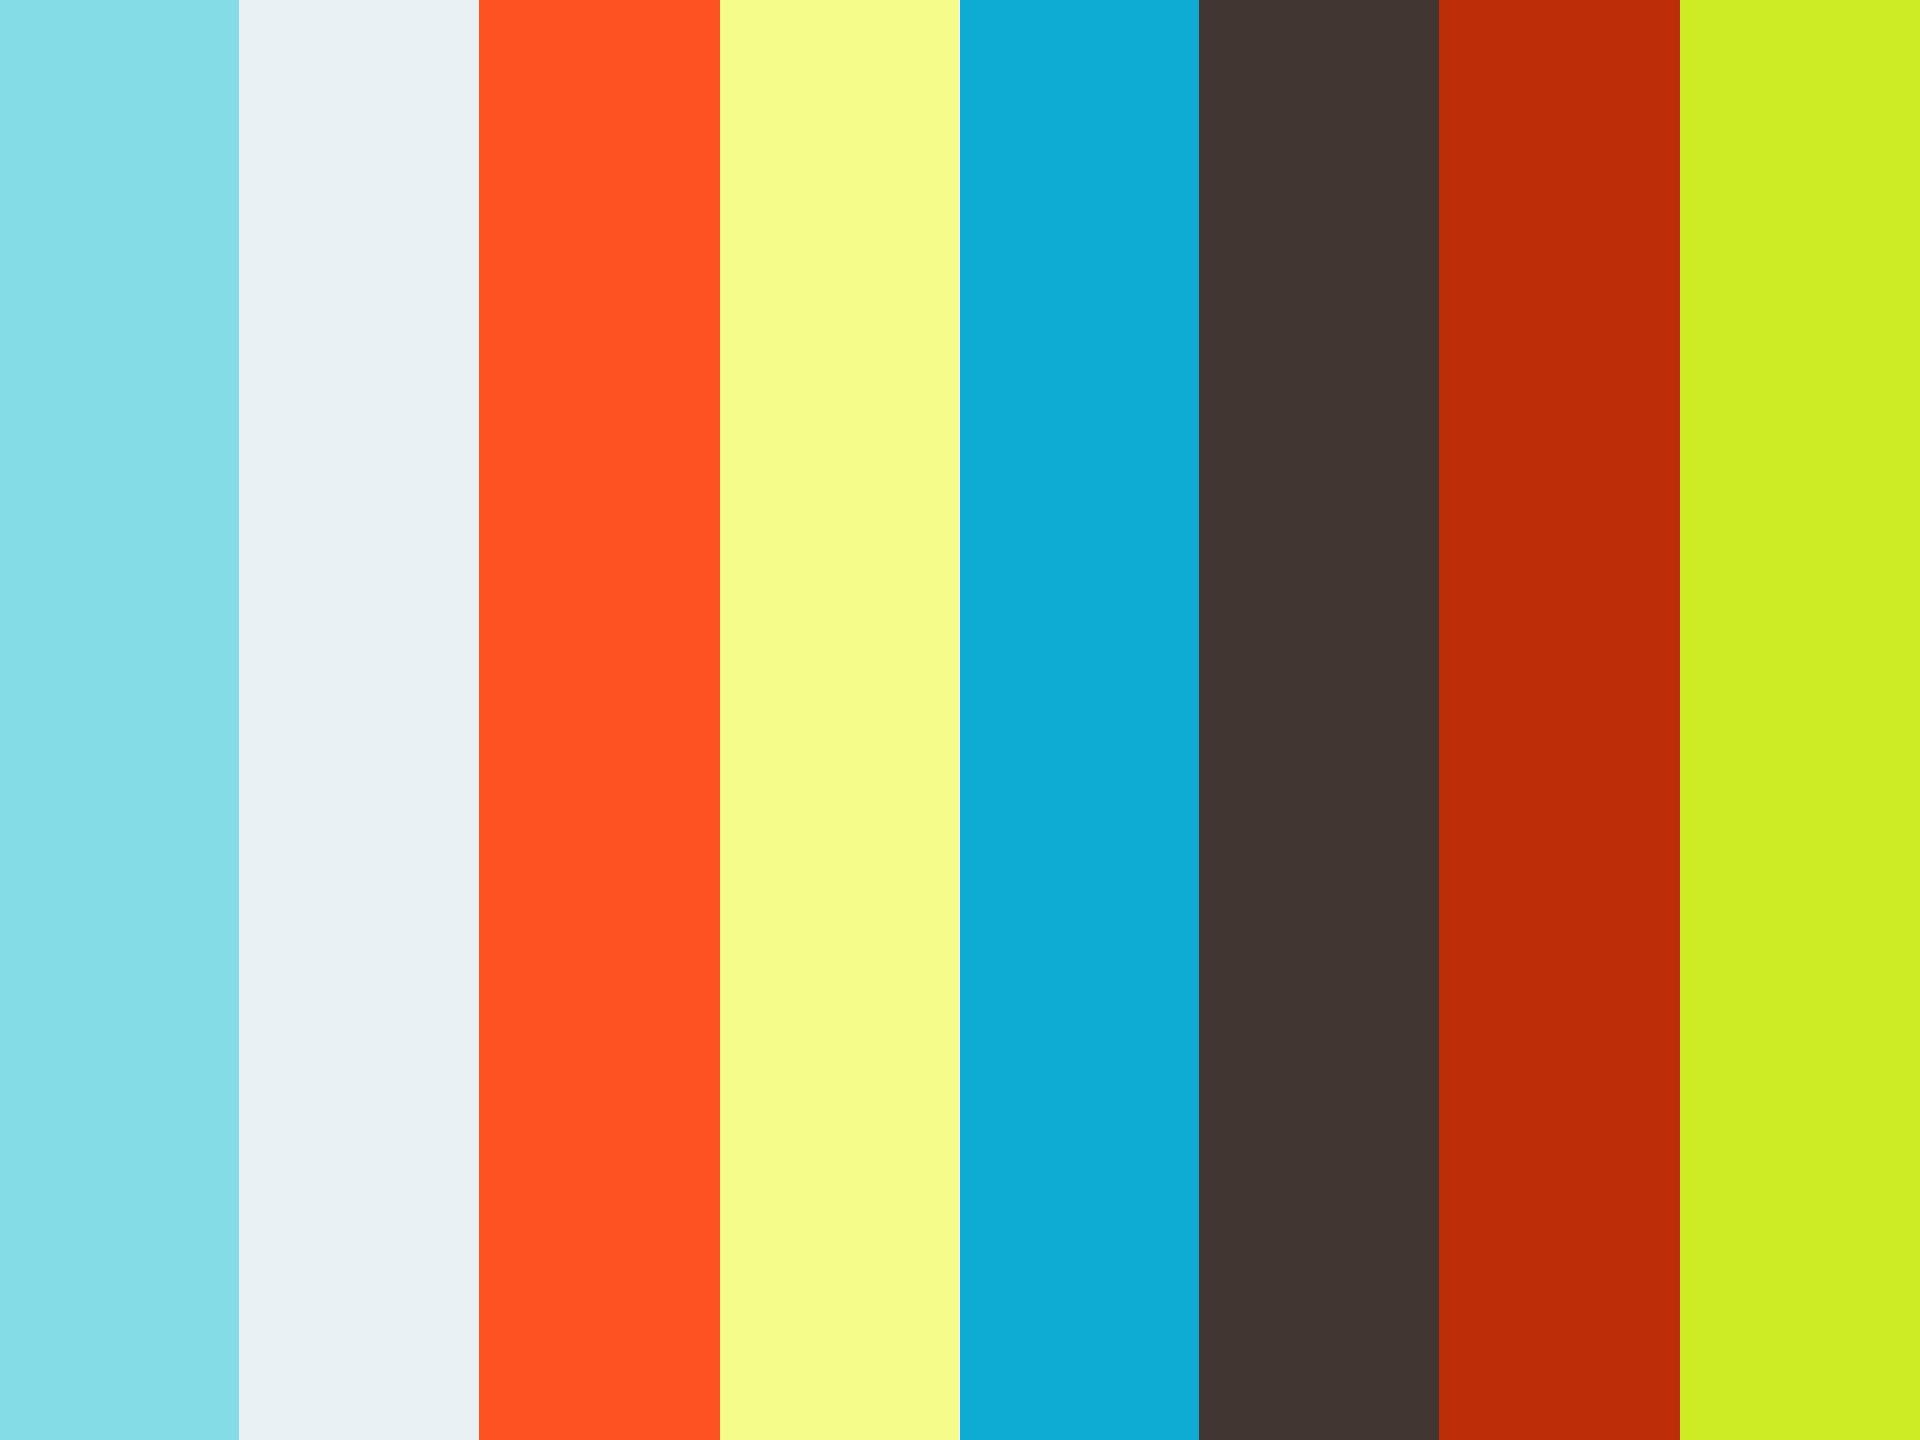 Summer Calvin Harris Official Music Video Summer Cover By Rippa Da Kid On Vimeo